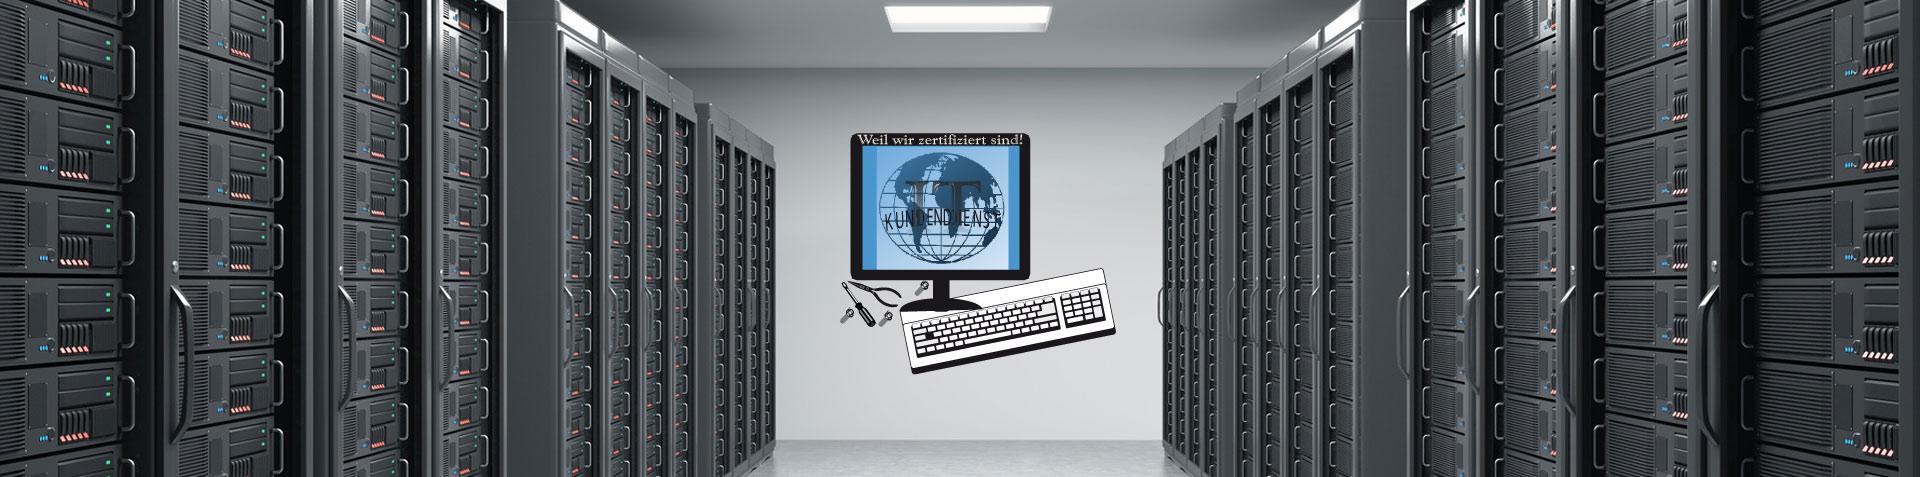 it-kundendienst-server-3